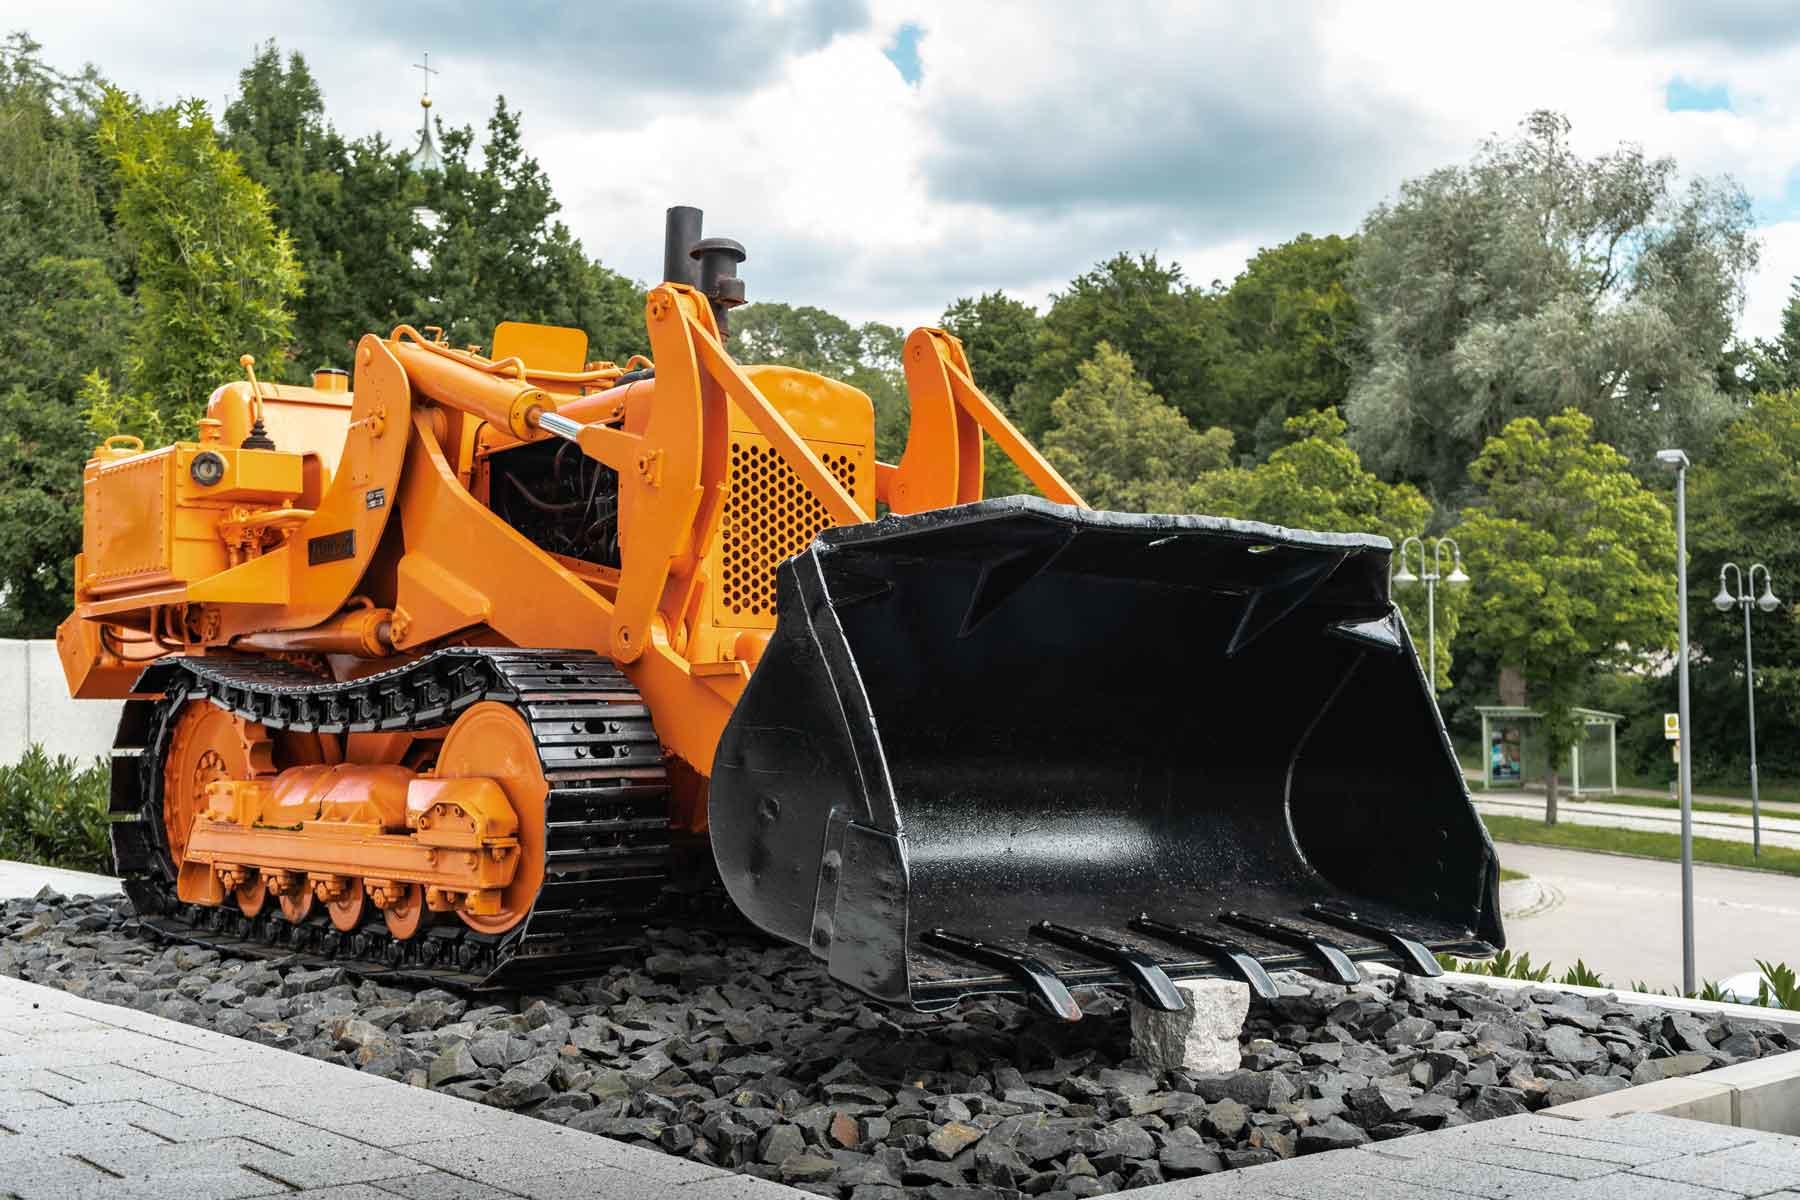 Alte Raupe der LS Bau AG in orange